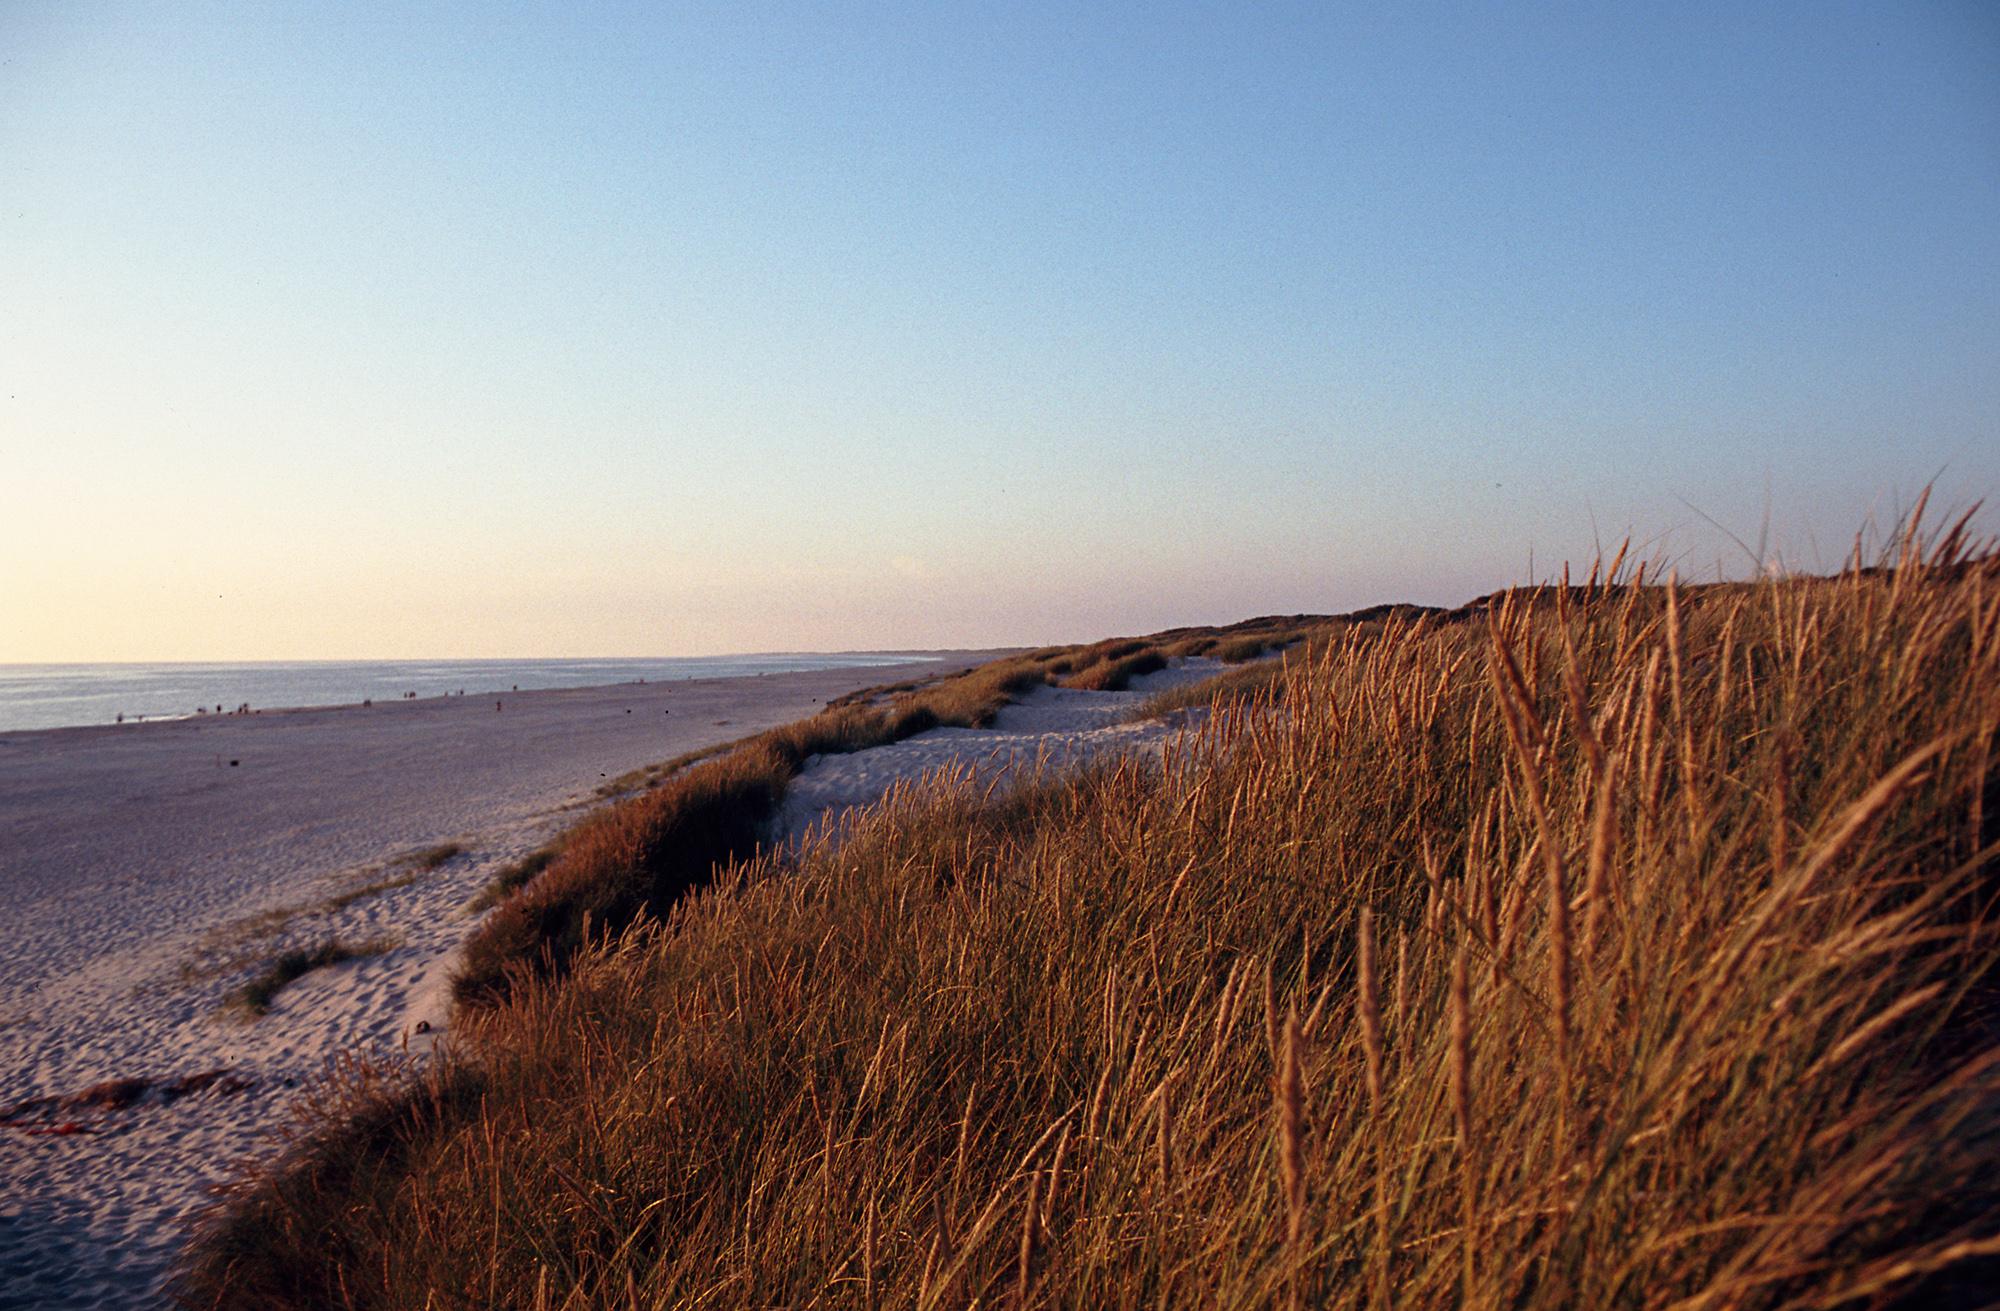 Strand nordsee sonnenuntergang  File:Henne Strand bei Sonnenuntergang.jpg - Wikimedia Commons